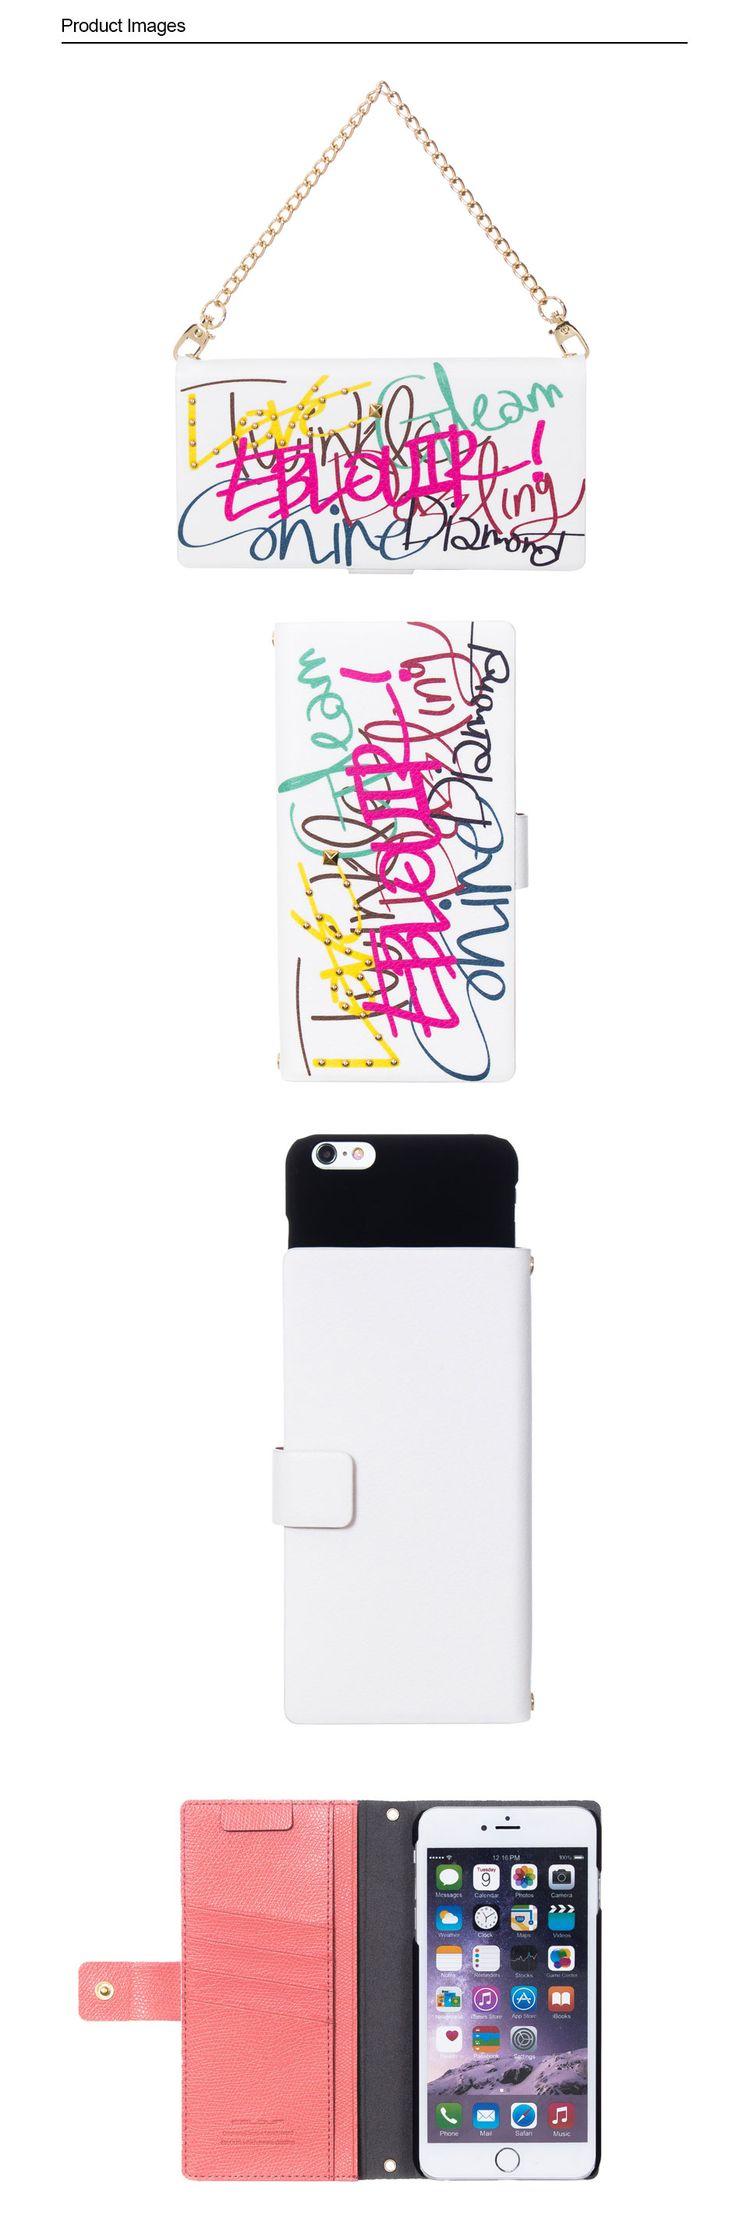 :: EBLOUIR ::Lettering folio #eblouir, #iphonecase, #phonecase, #iphone, #iphone6, #iphone6s, #plus #style, #accessories, #best, #protective, #design, #mobile, #life